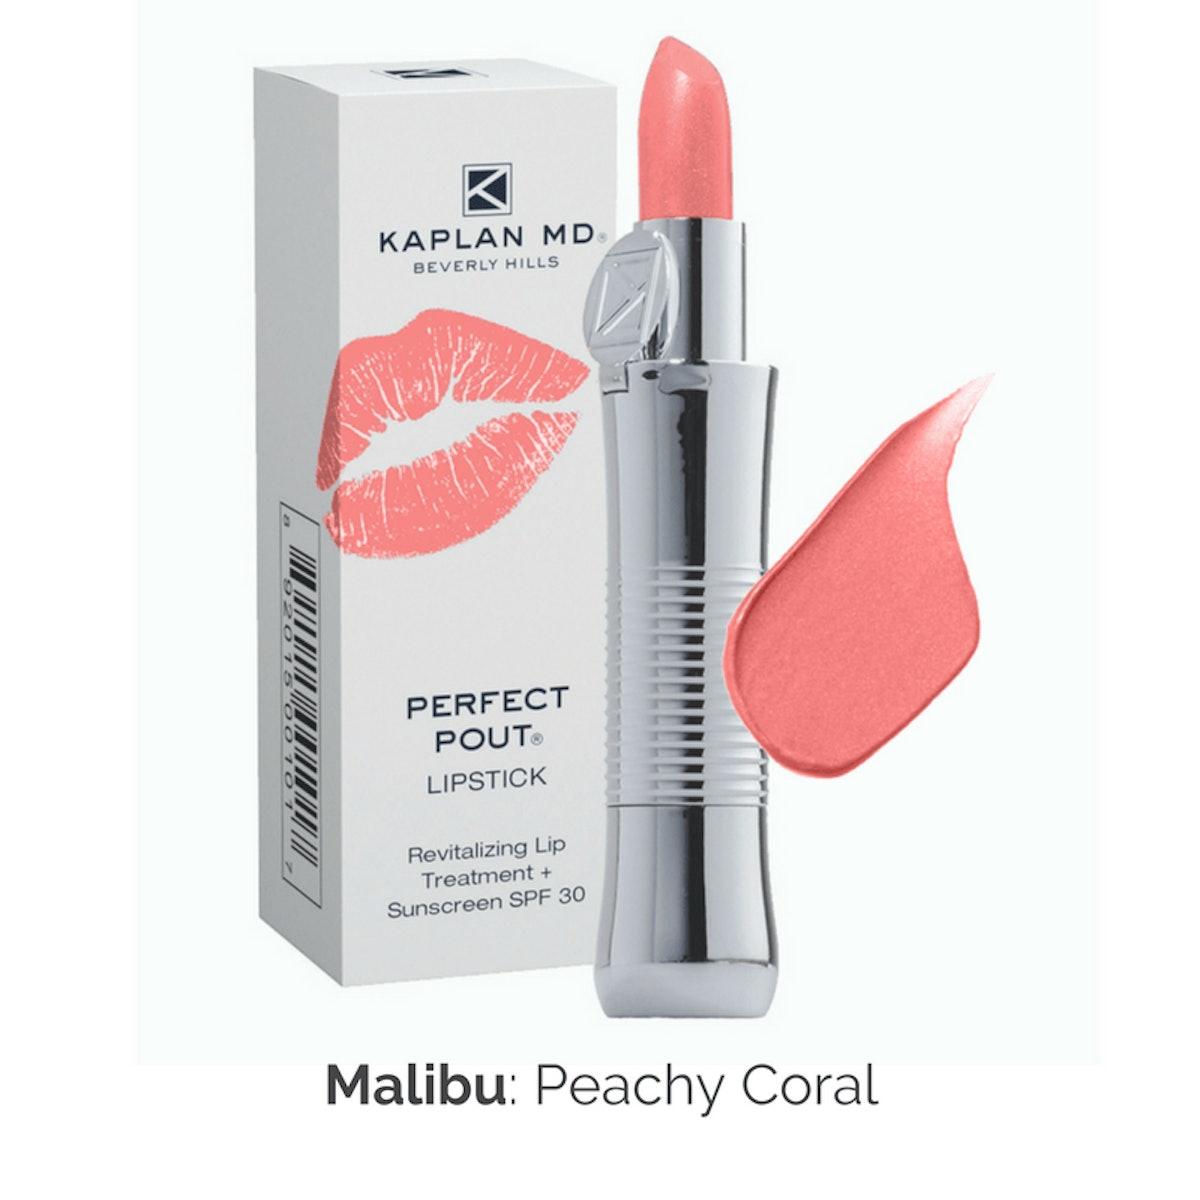 Perfect Pout Lipstick Revitalizing Treatment + SPF 30 Sunscreen